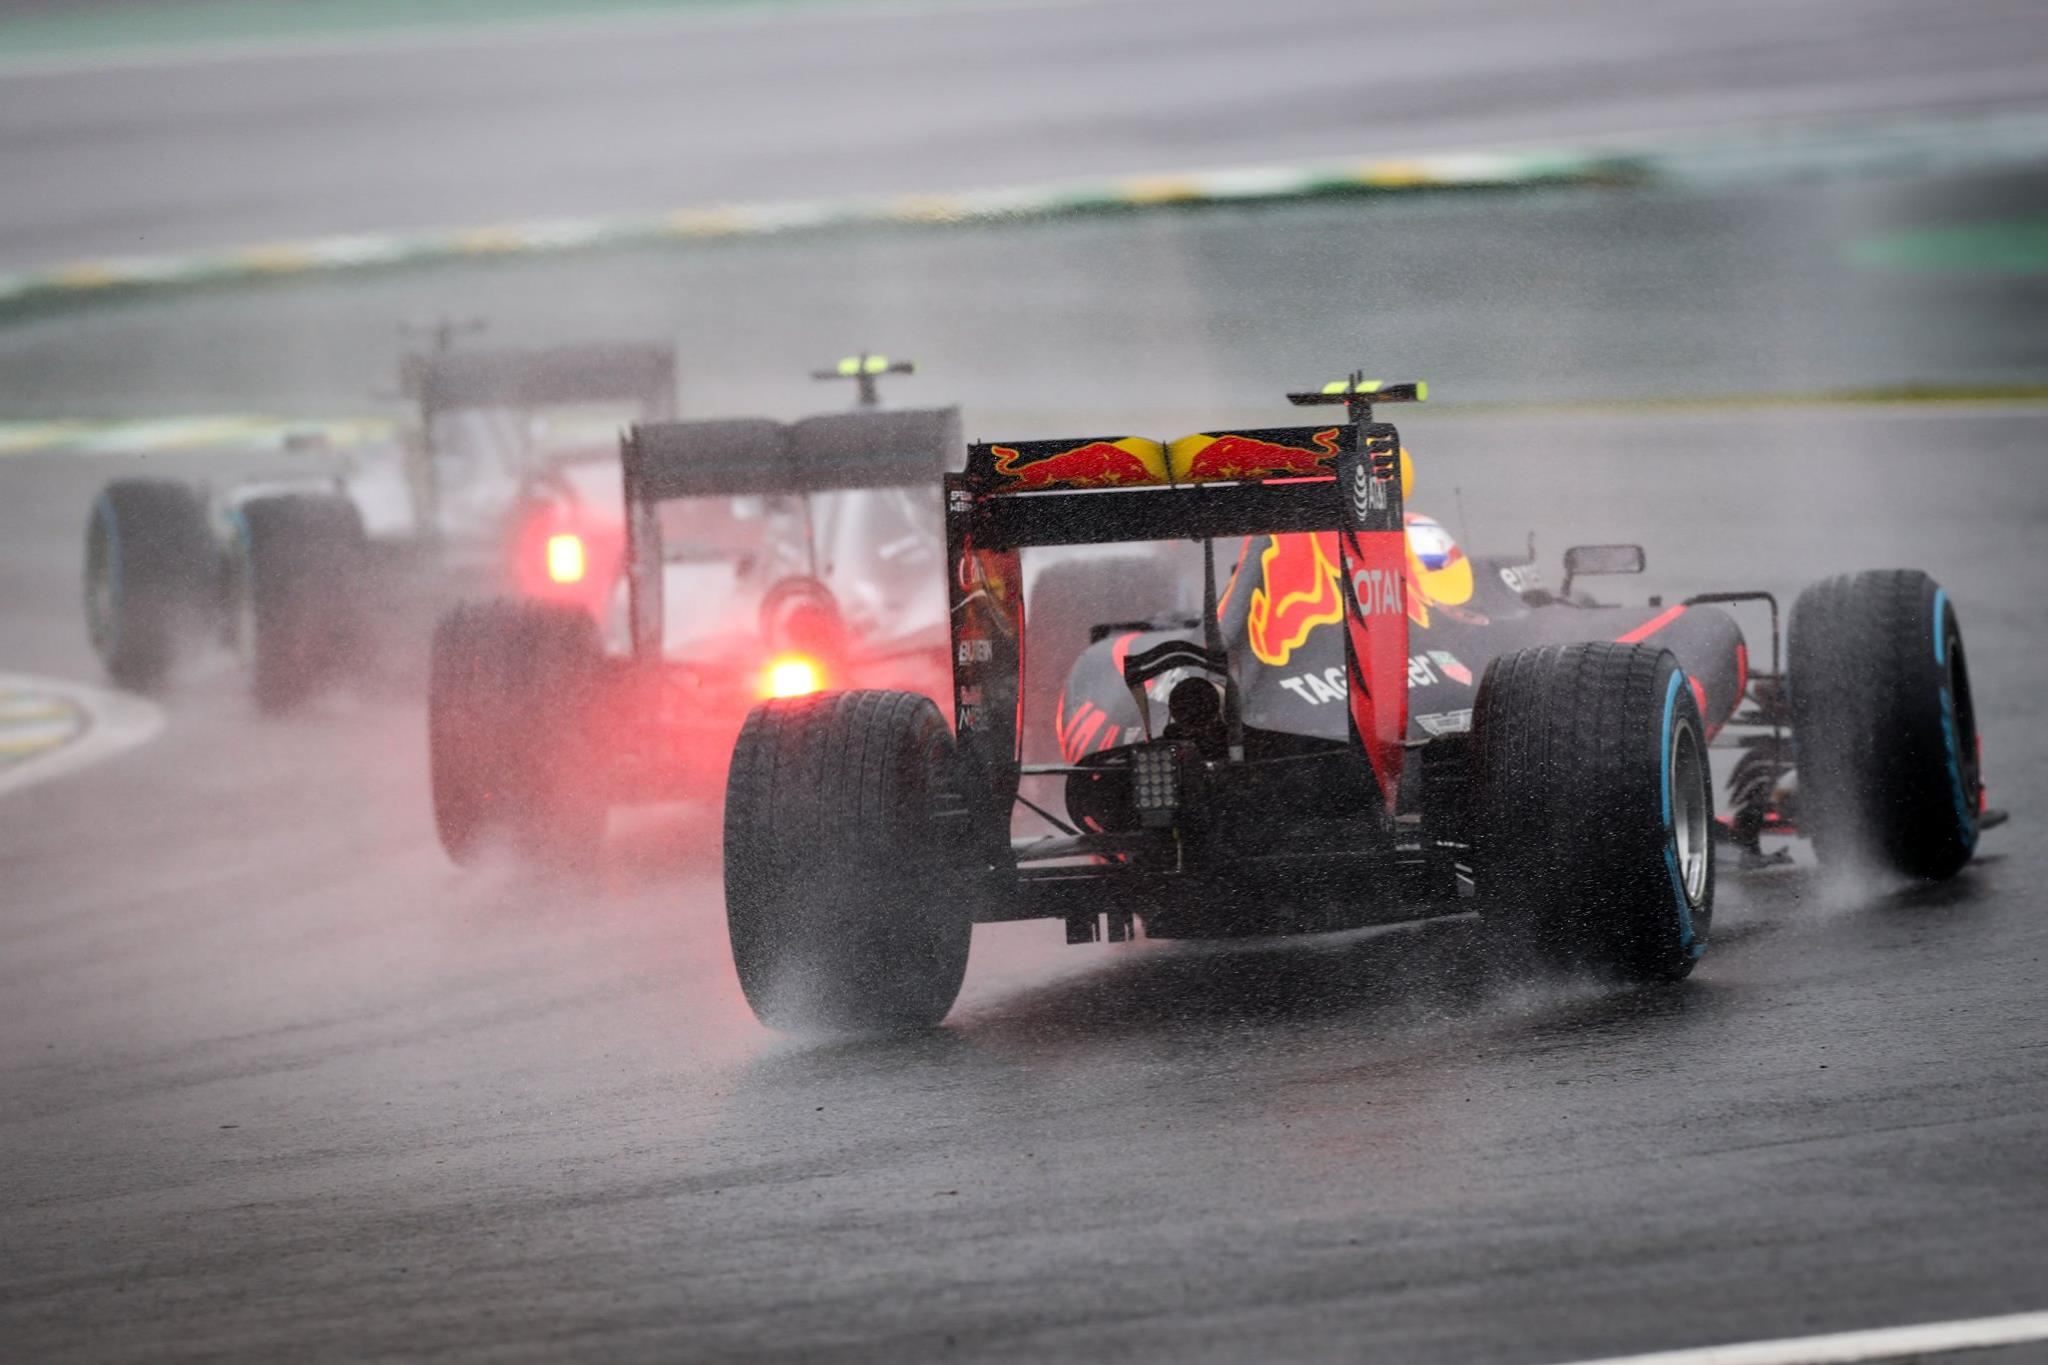 Double Header F1 Races per weekend? Bernie Ecclestone Wants 2 Races